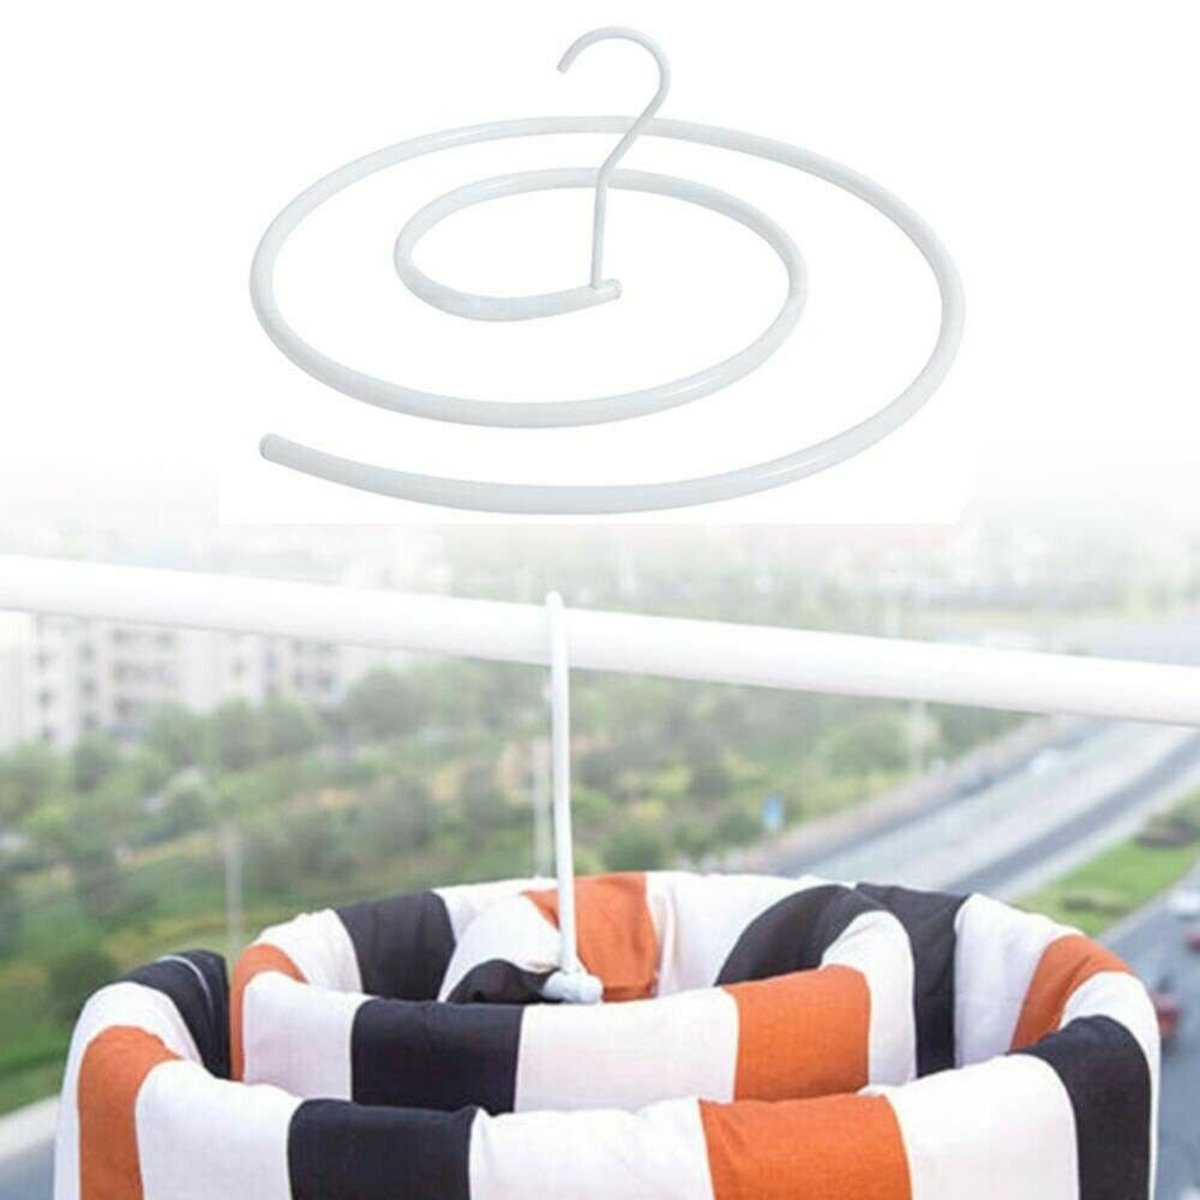 Spiral-shaped Iron Quilt Sheets Hanger Cover Drying Hook Quilt Design Blanket